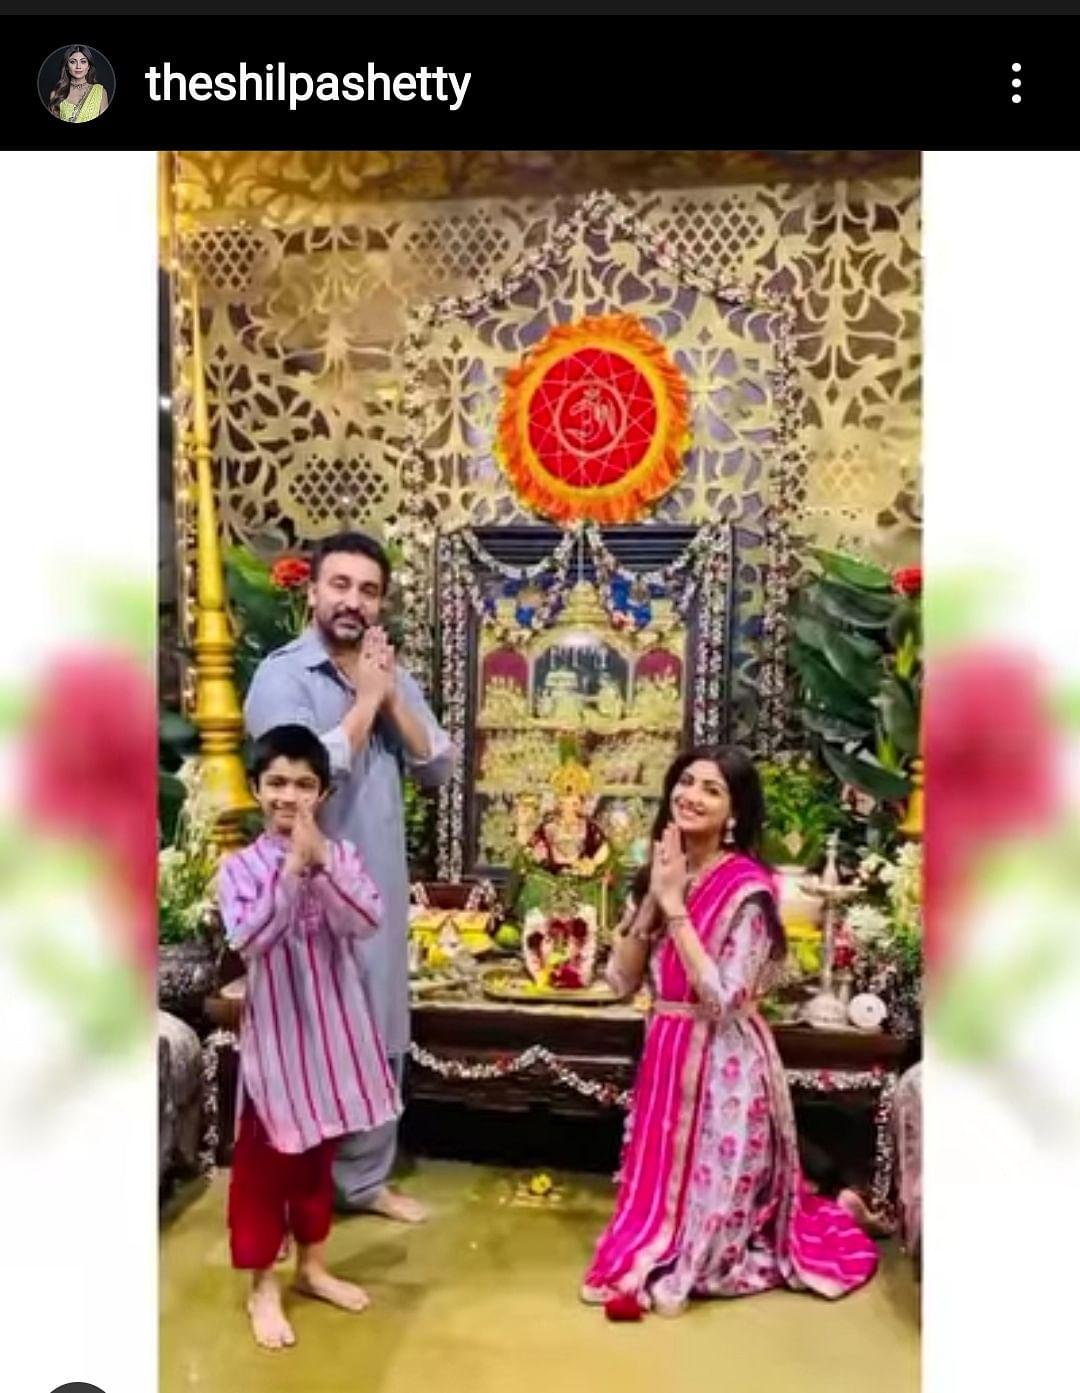 Shilpa Shetty's special ganpati celebrations.